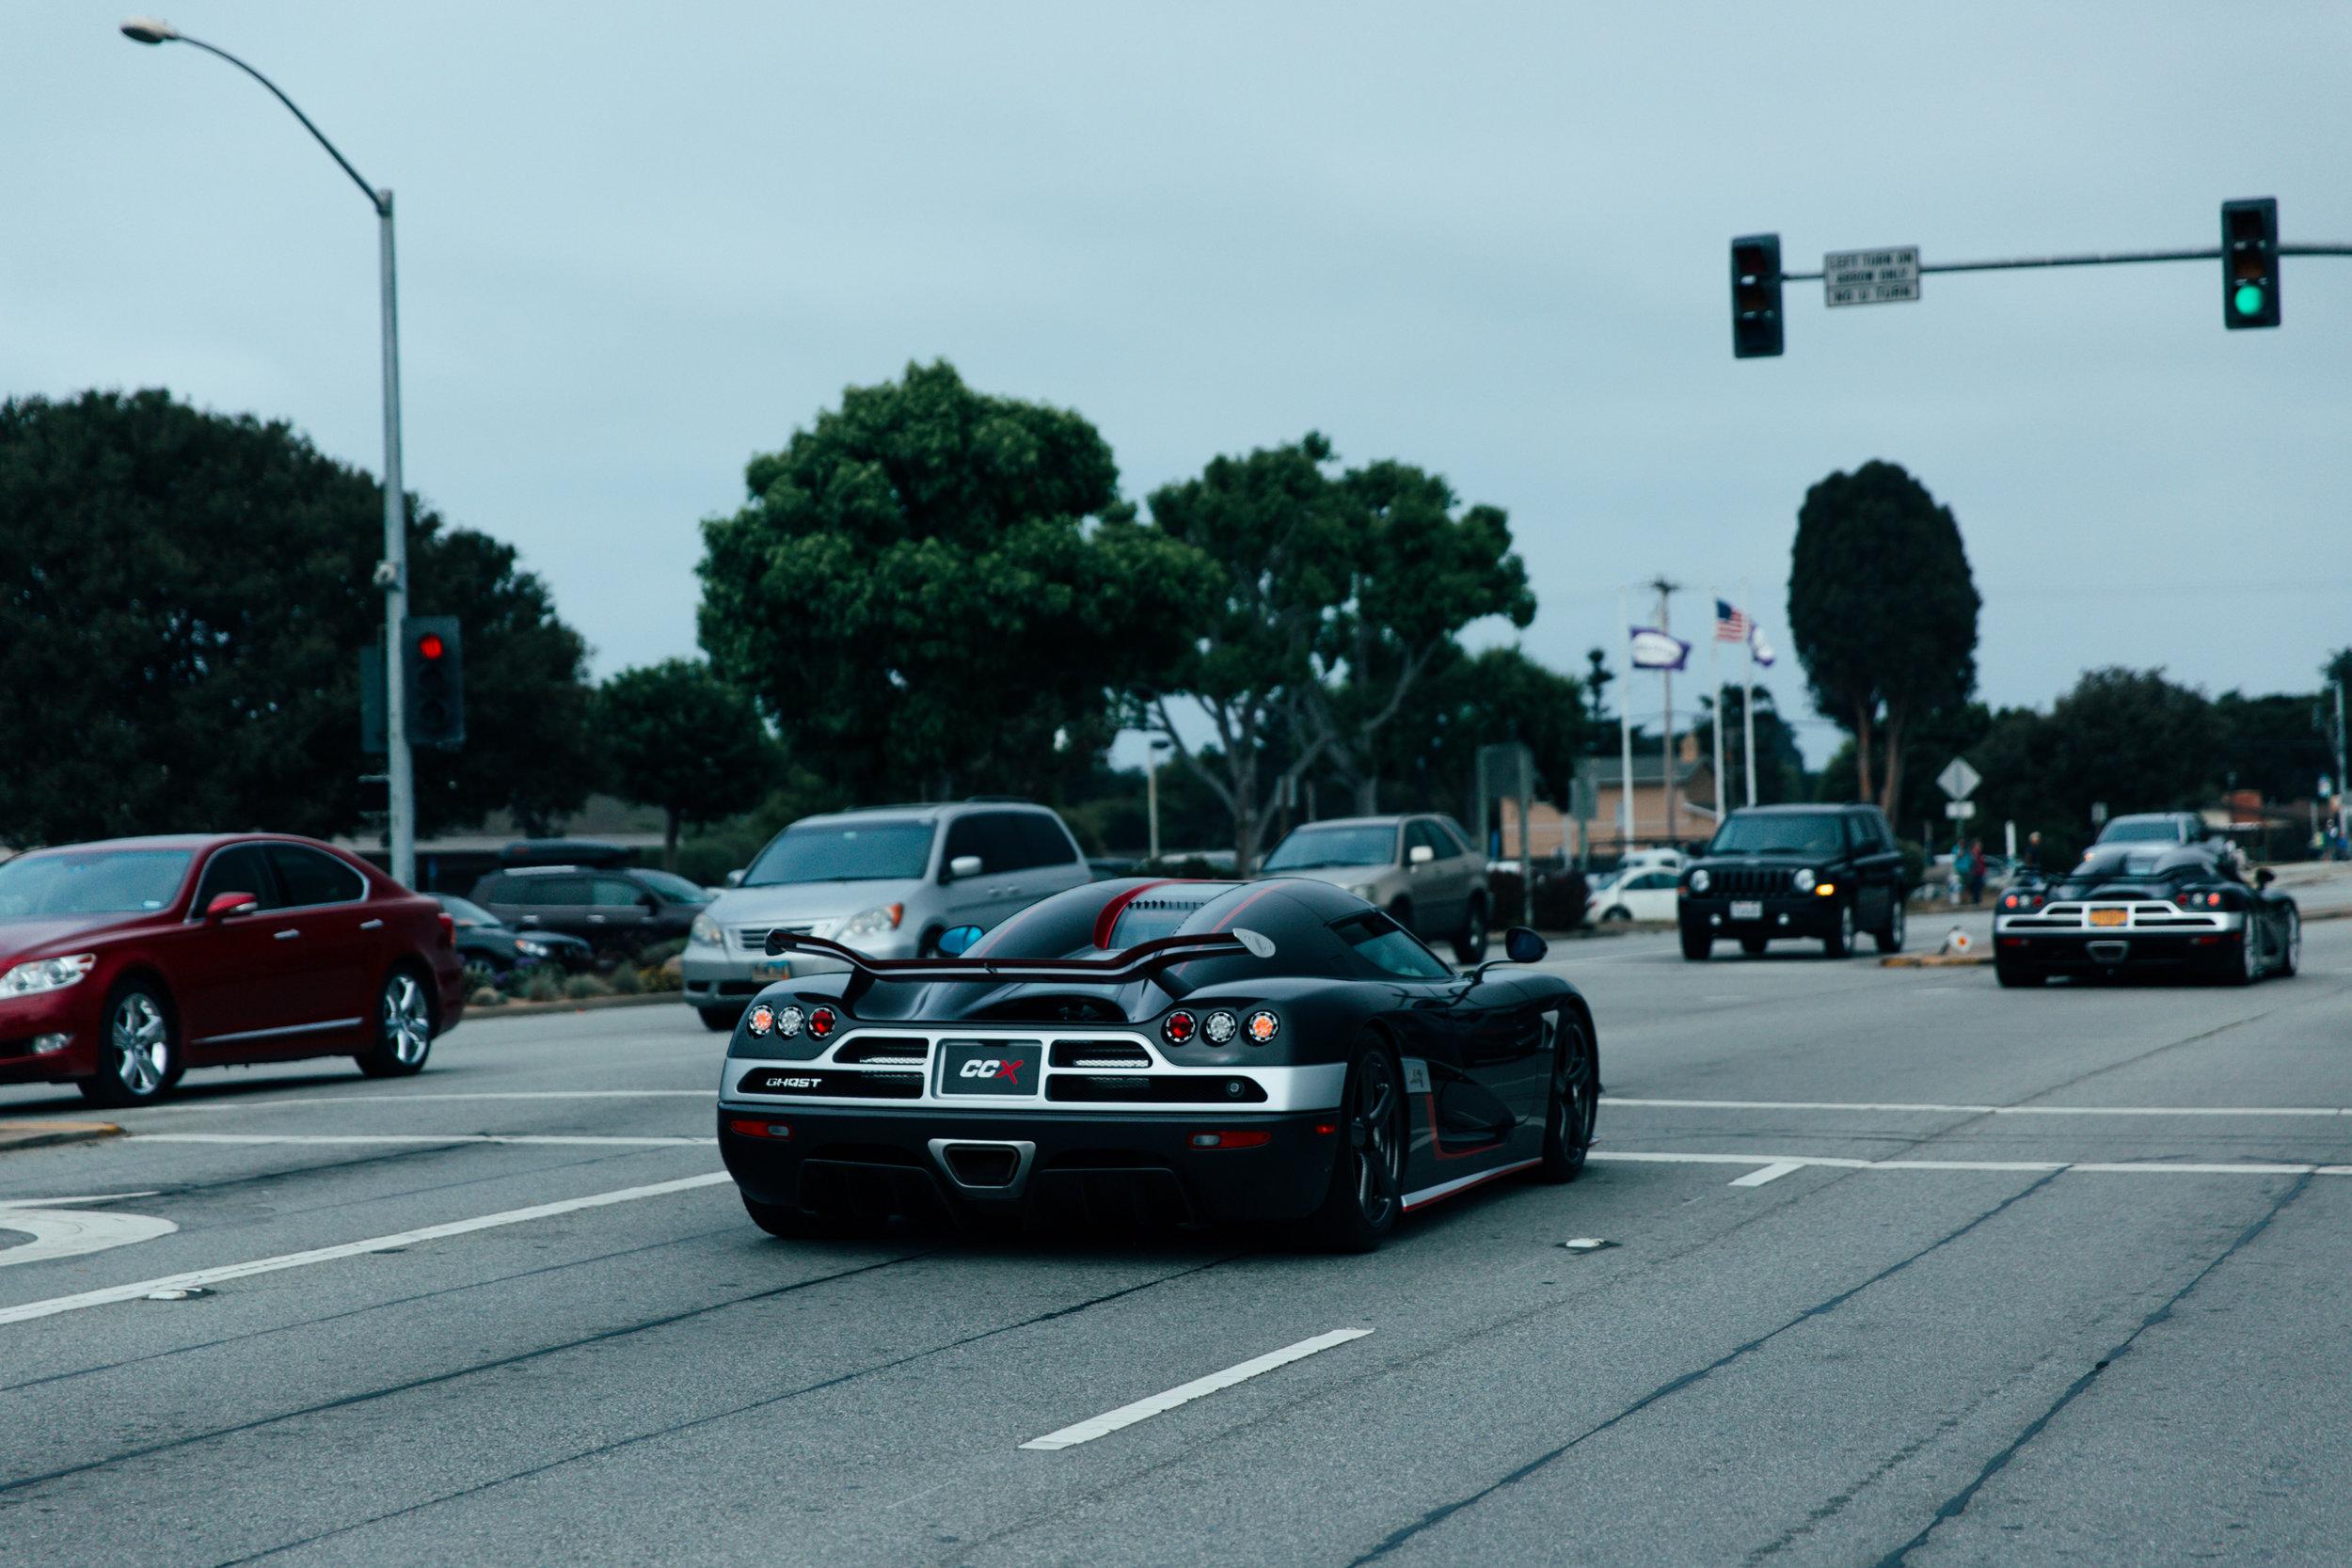 Stay_Driven_Monterey_Car_Week_Koenigsegg-22.jpg